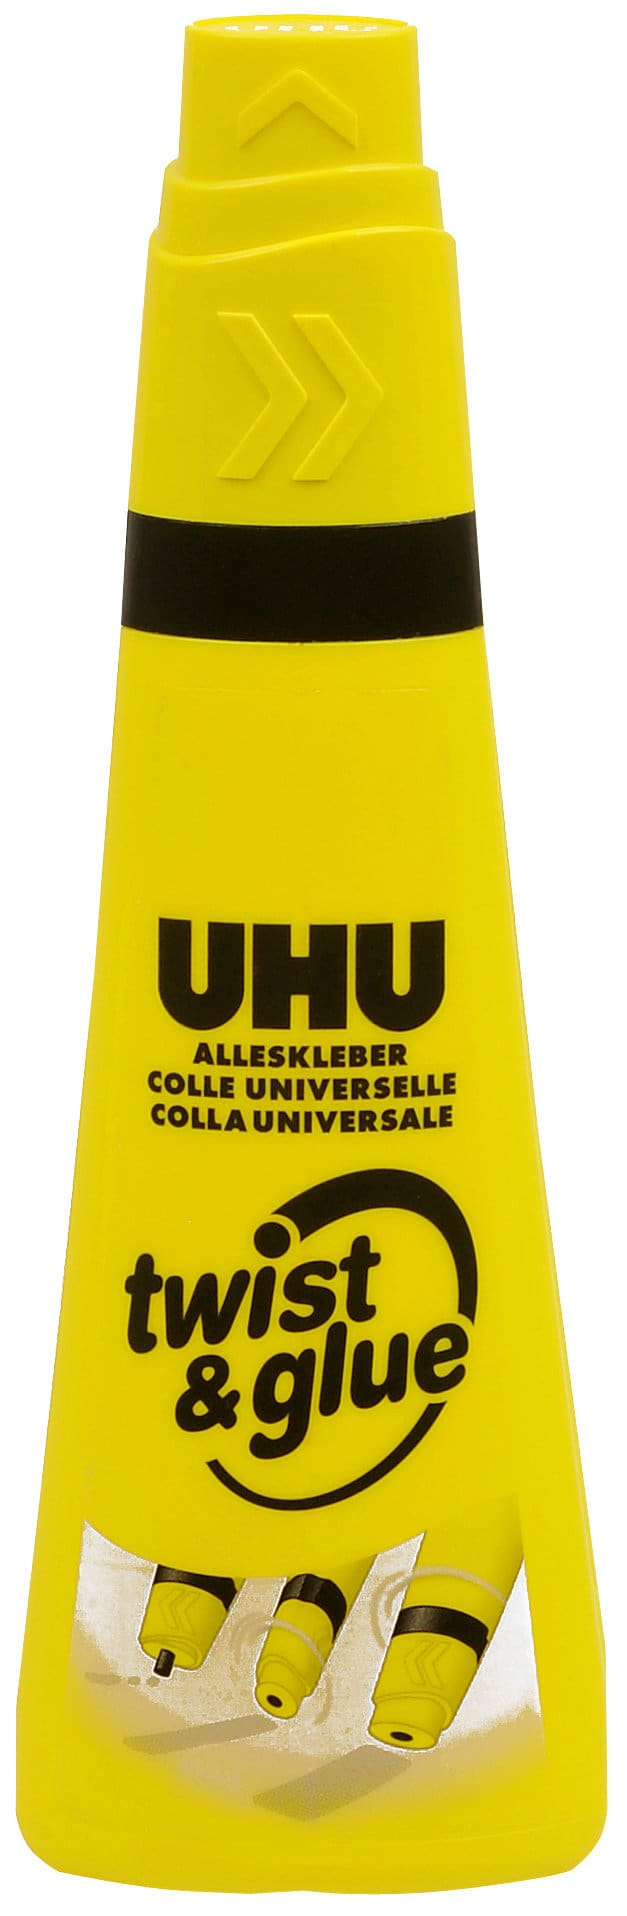 Uhu Colle tout twist&glue